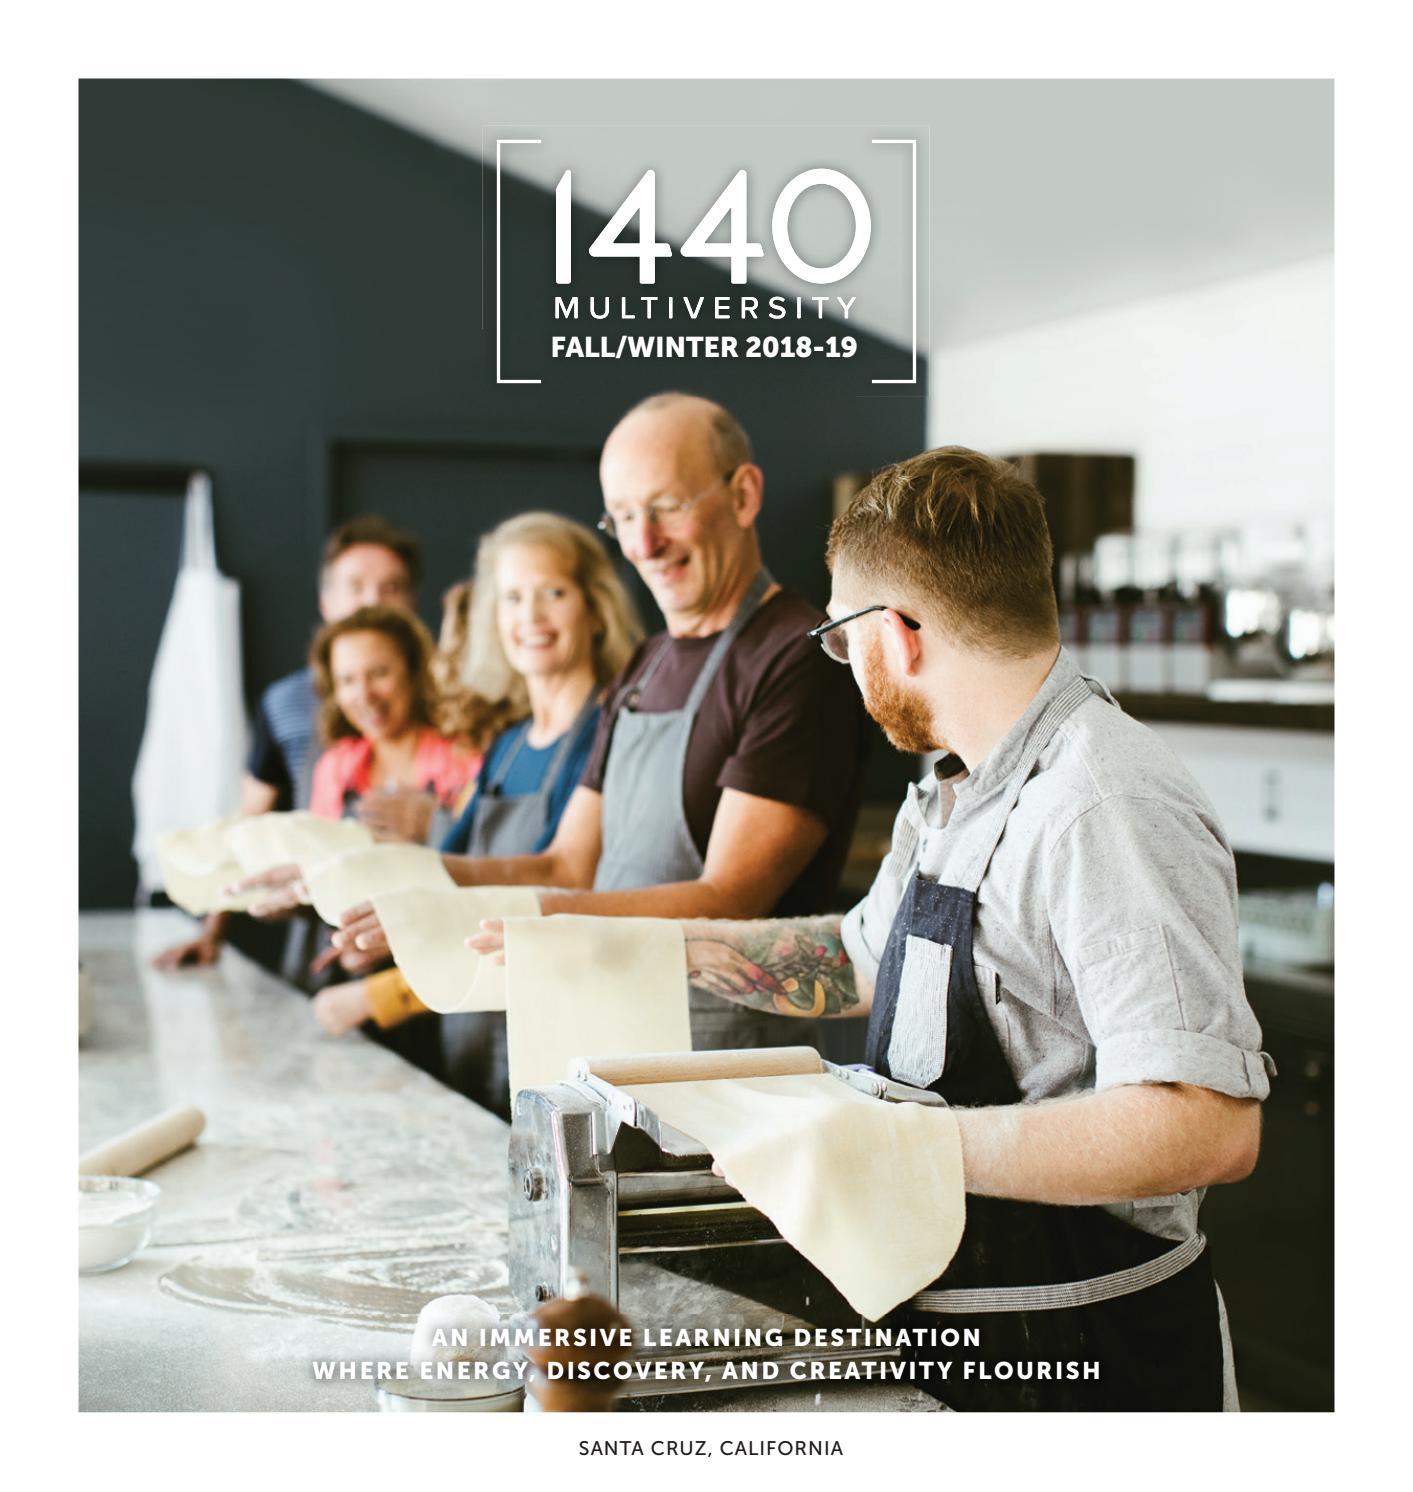 1440 Multiversity Fall/Winter 2018 – 2019 Catalog by 1440